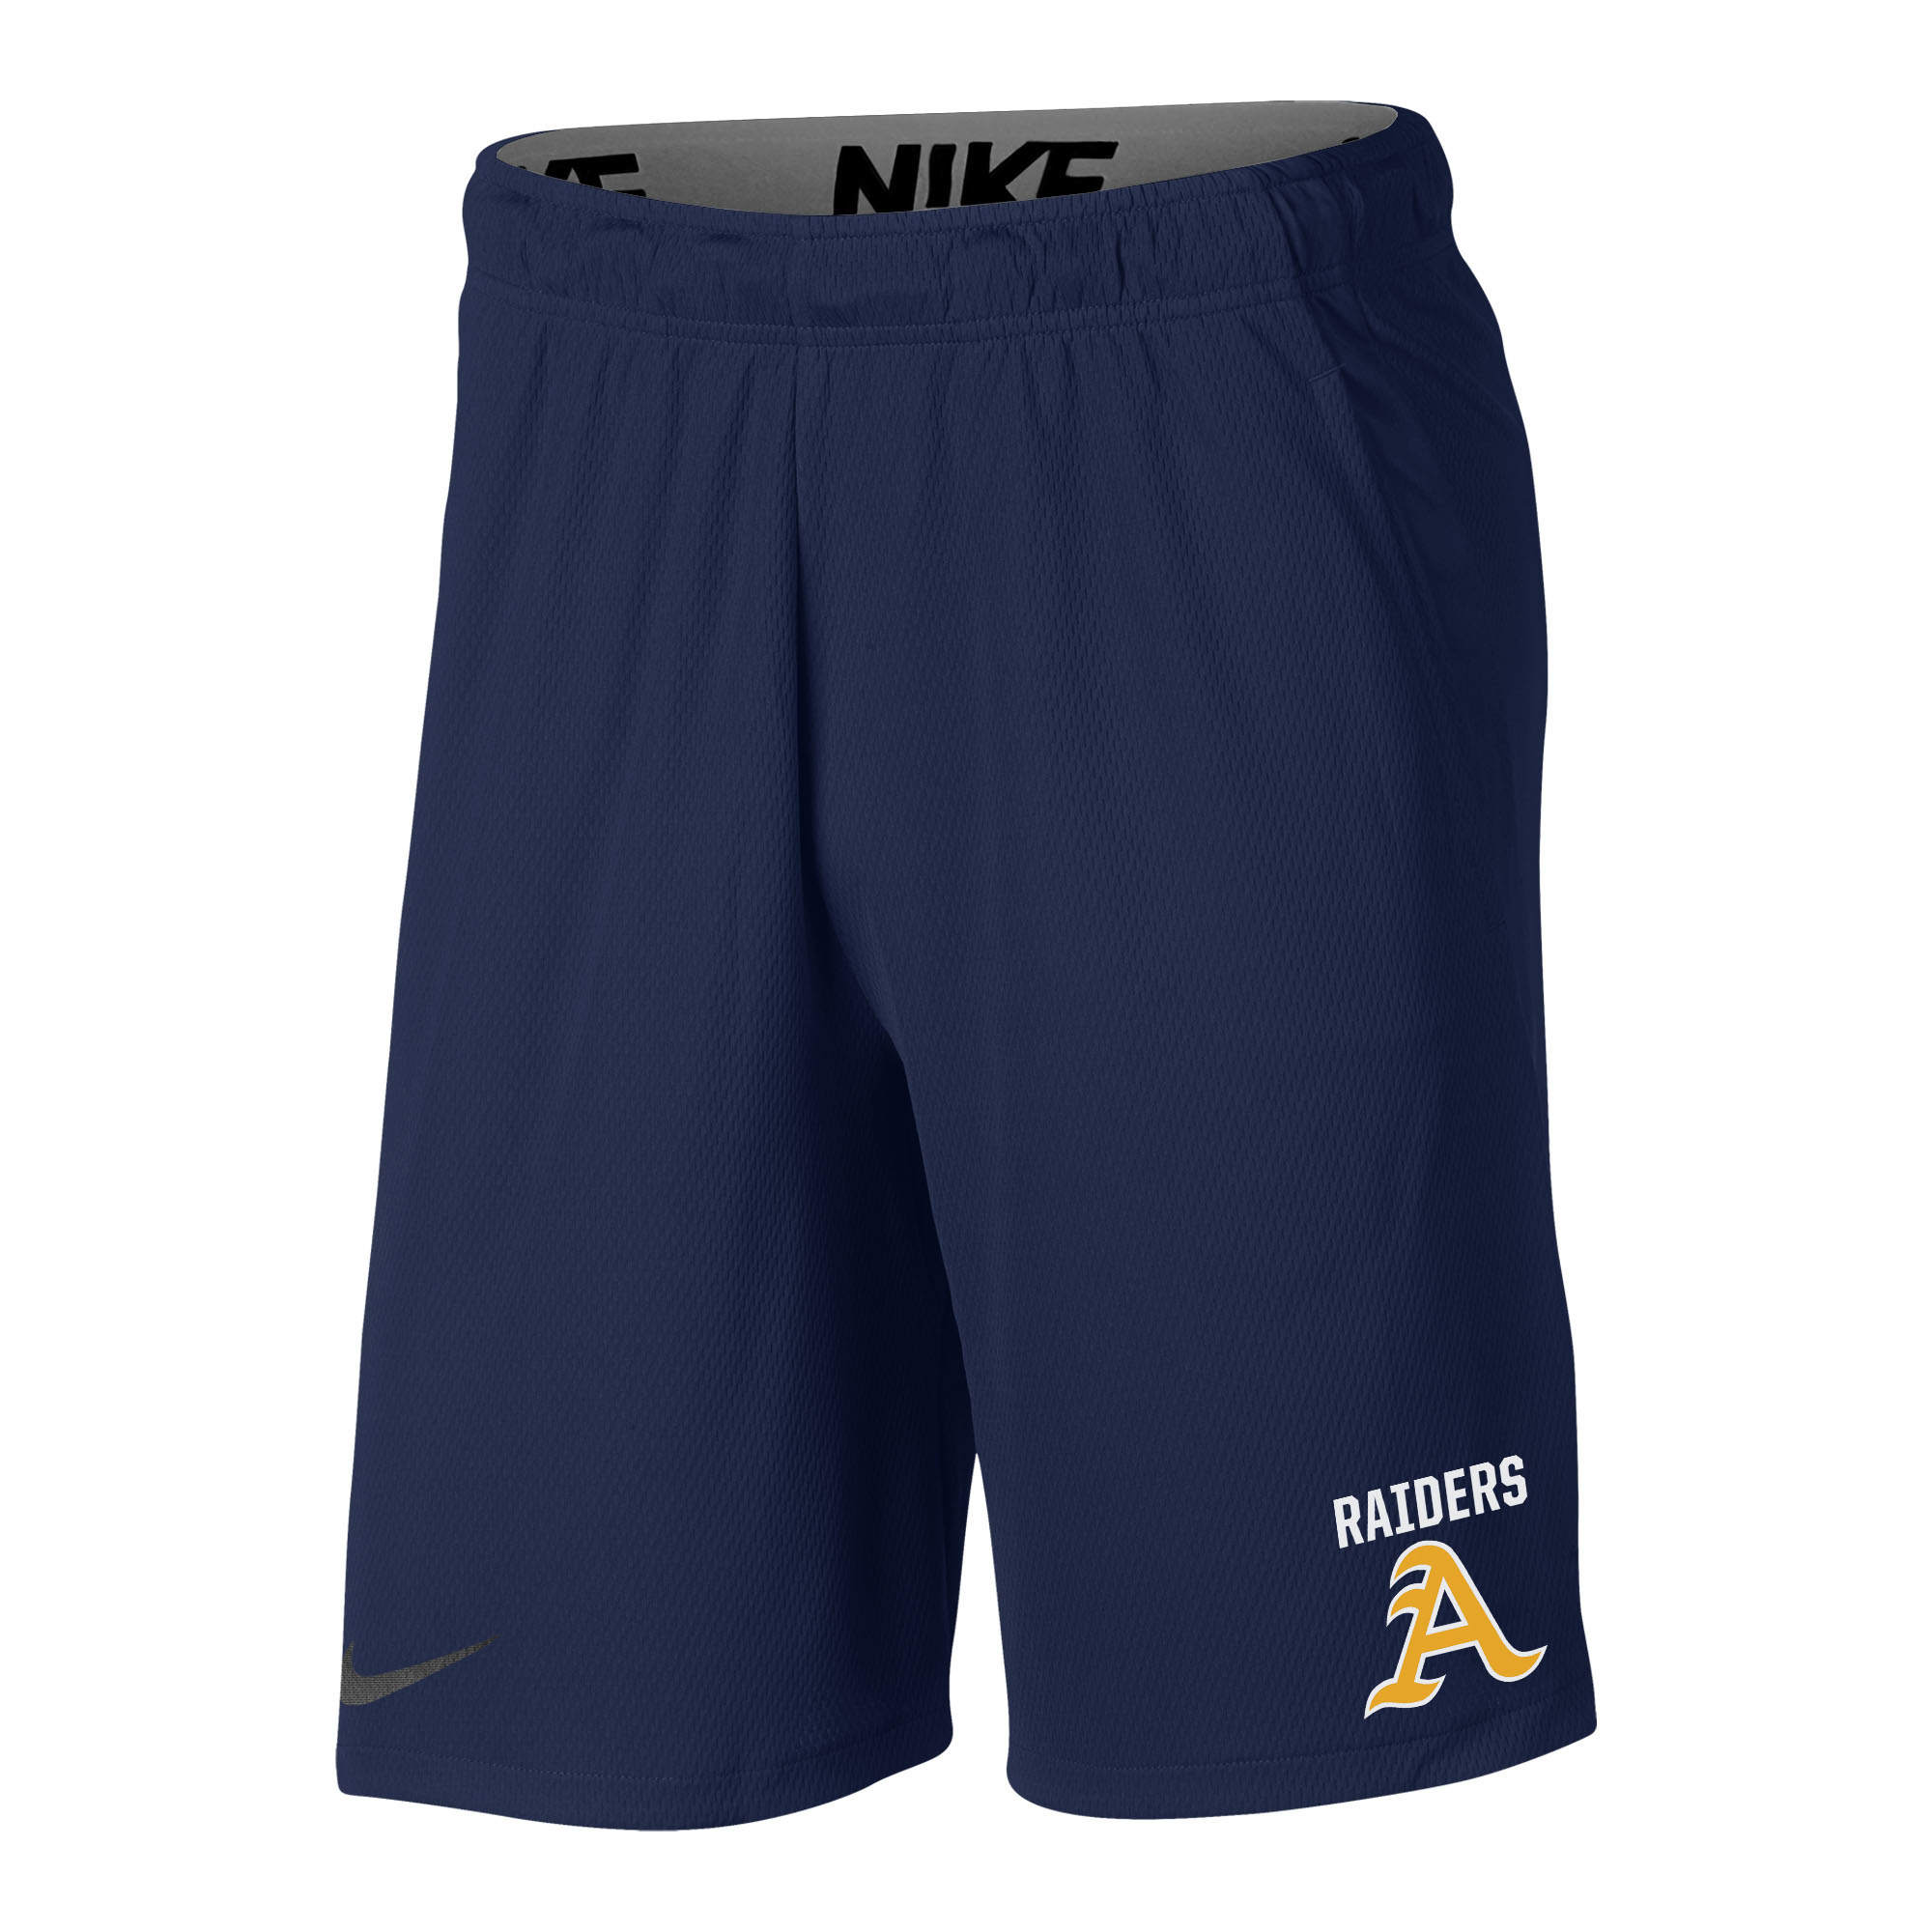 Nike 2021 M Hype Shorts Navy